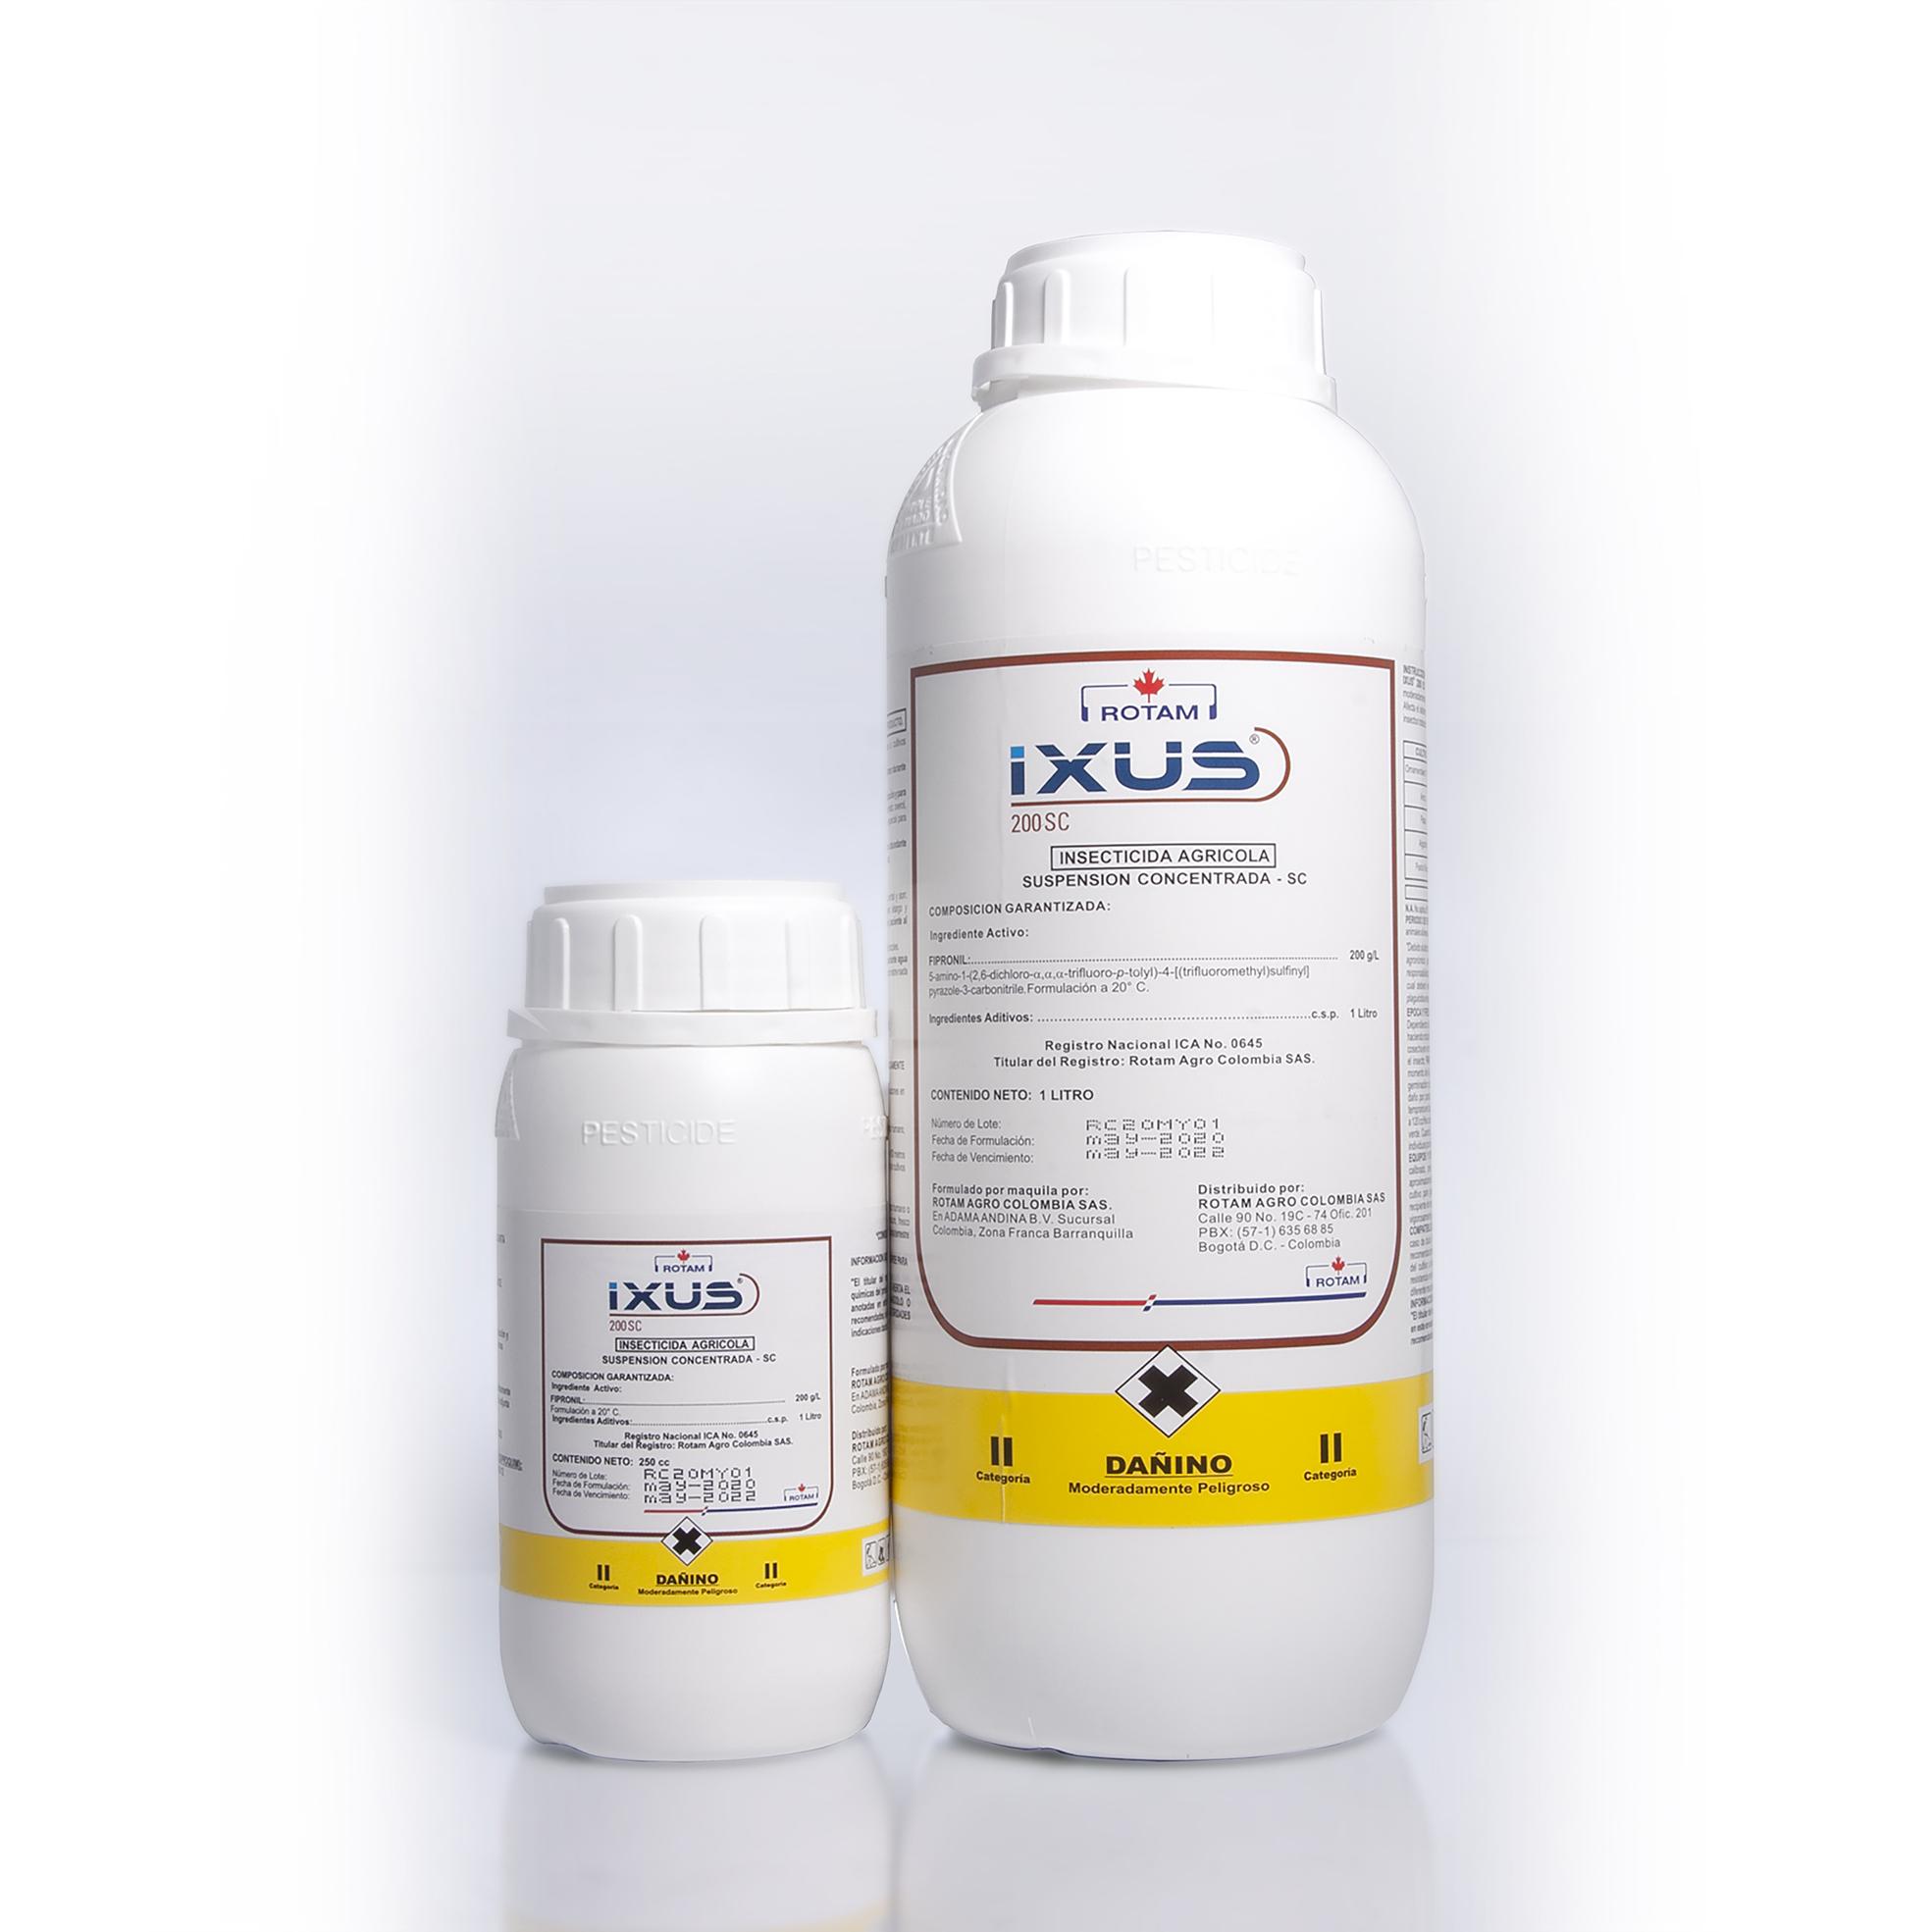 Insecticida-IXUS-Rotam.jpg